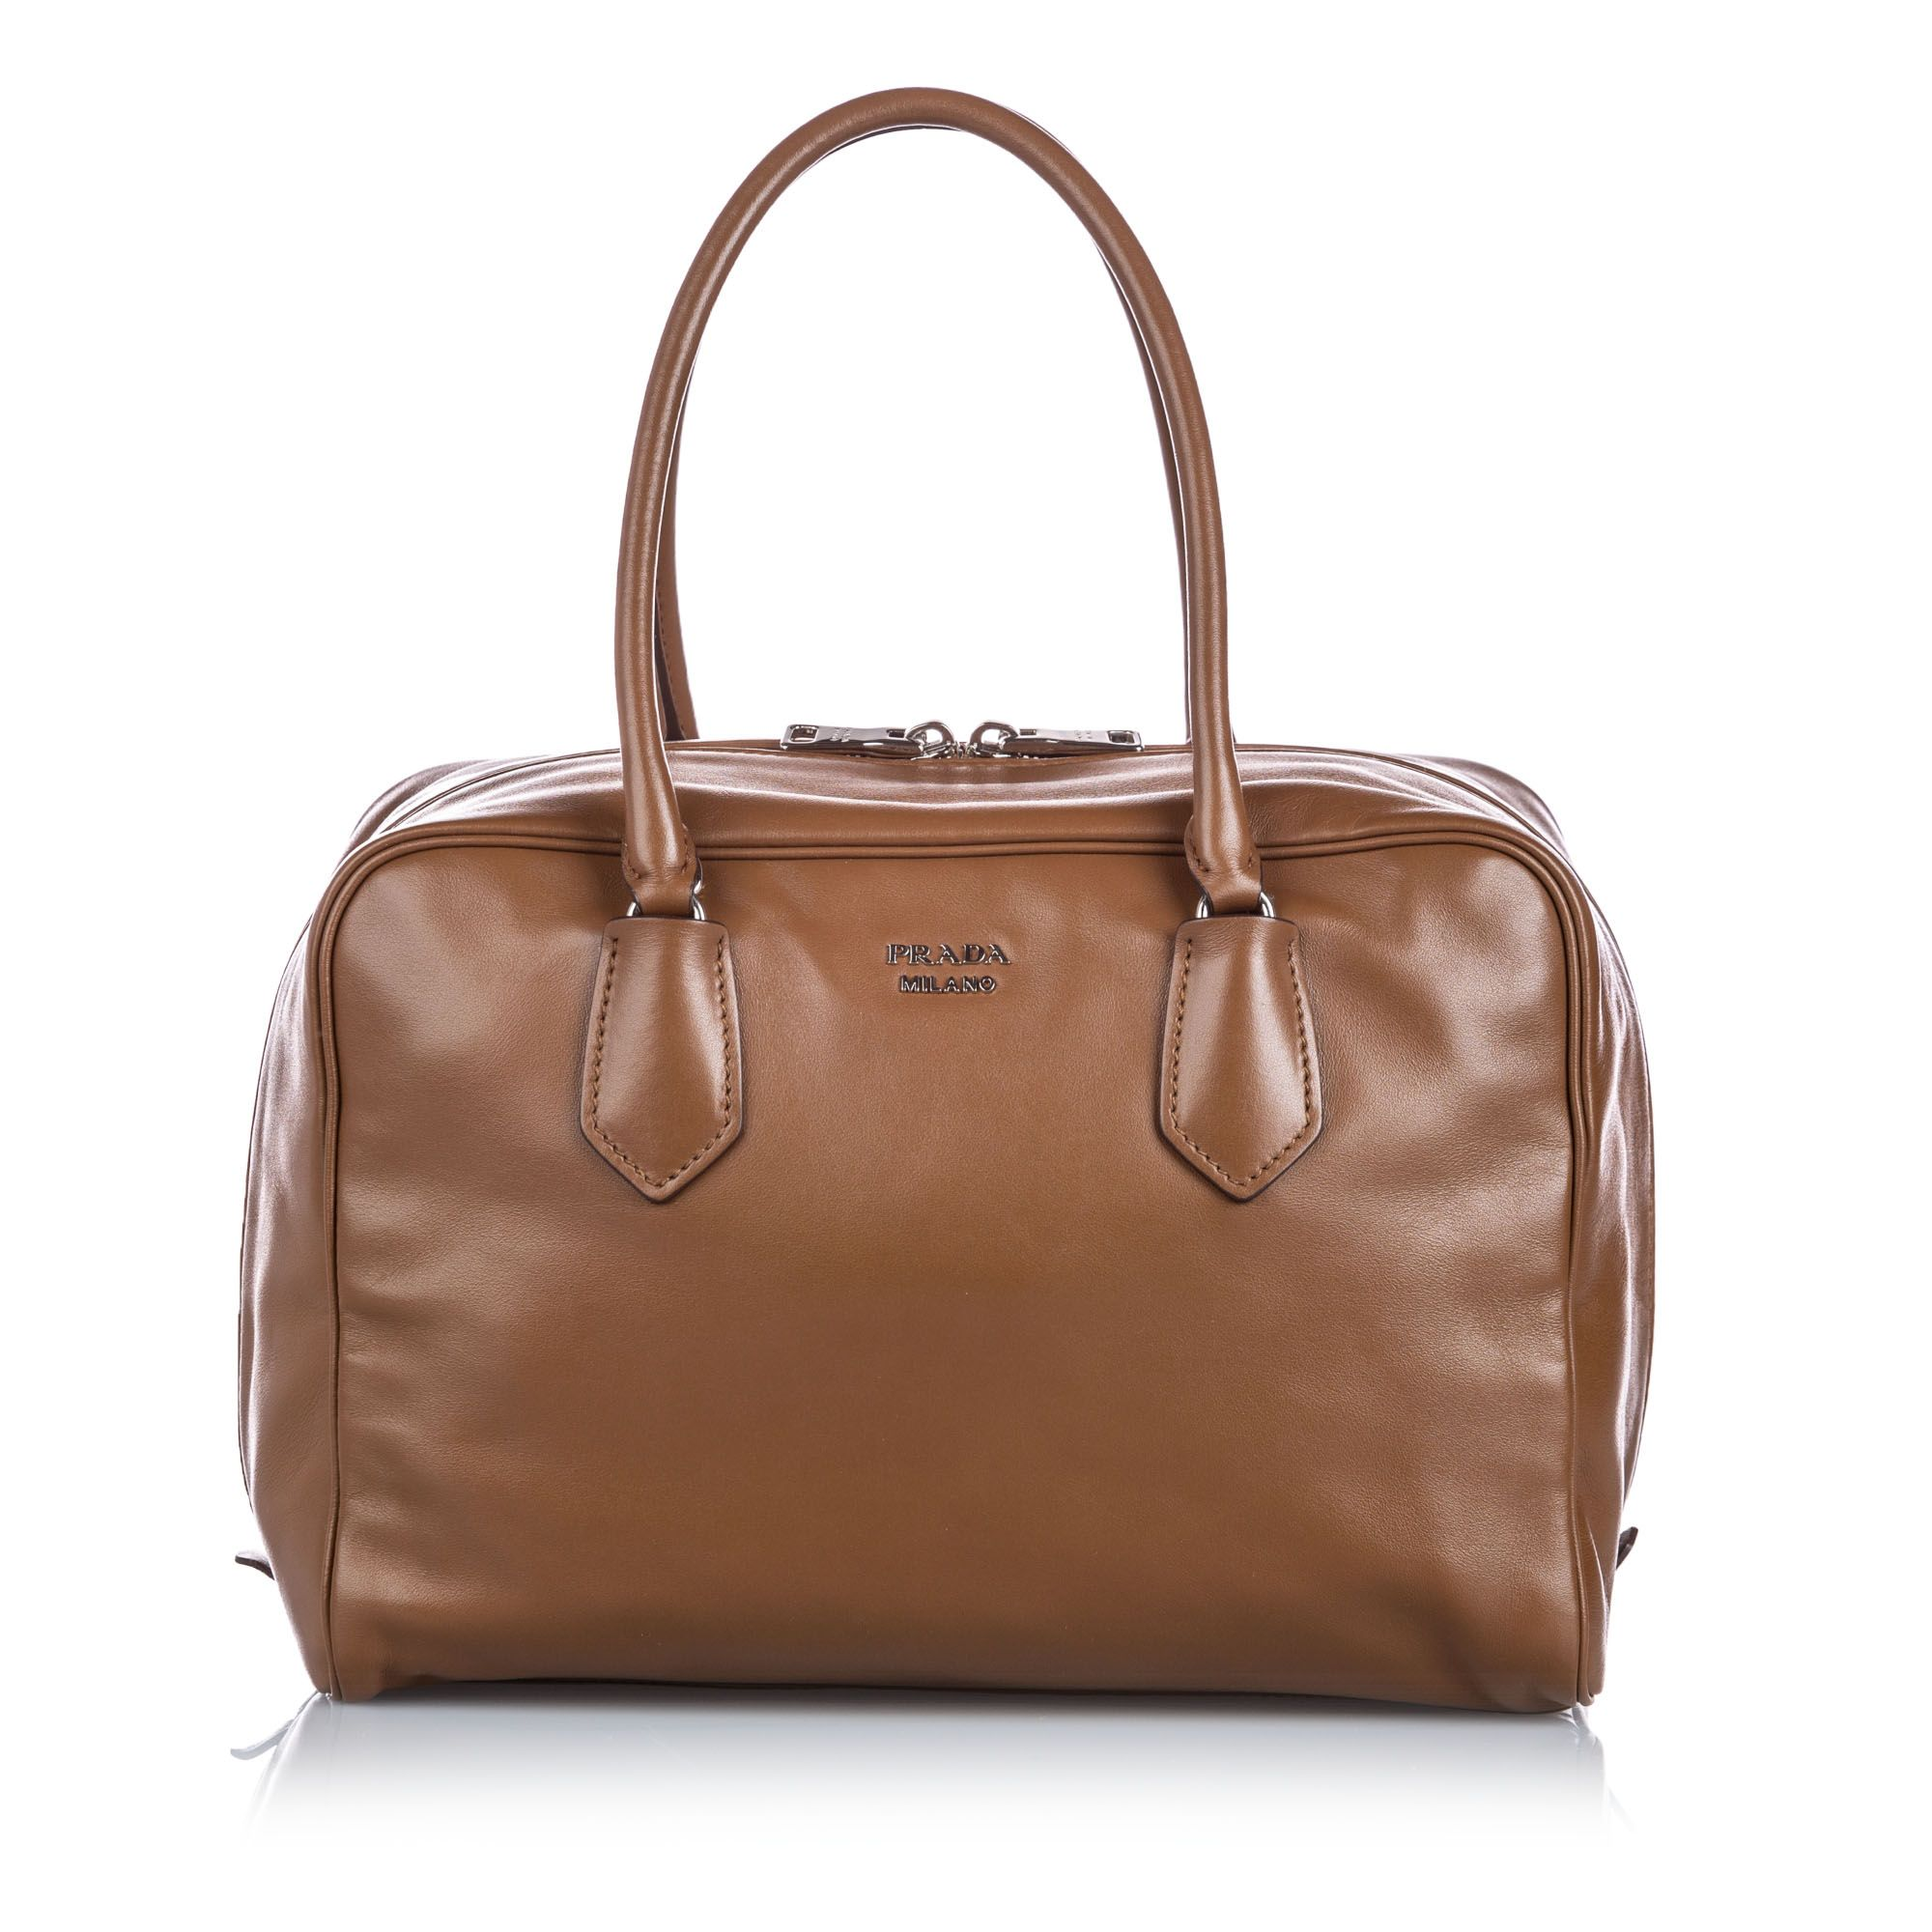 Vintage Prada Medium Soft Calf Inside Bag Brown